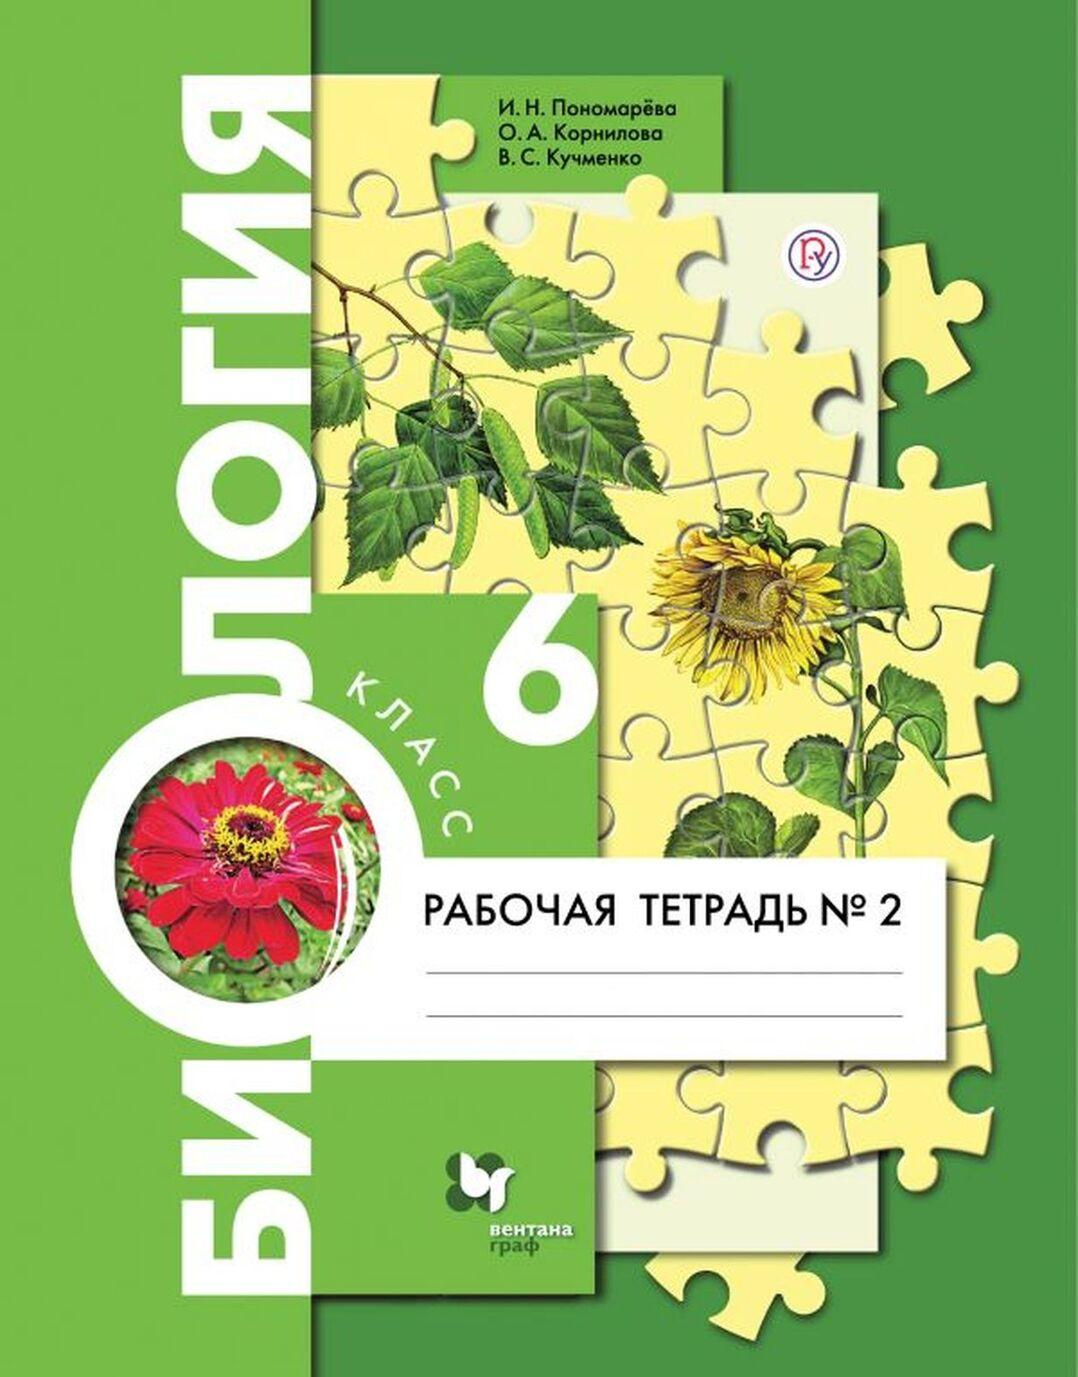 Biologija. 6klass. Rabochaja tetrad № 2 | Ponomareva Irina Nikolaevna, Kornilova Olga Anatolevna